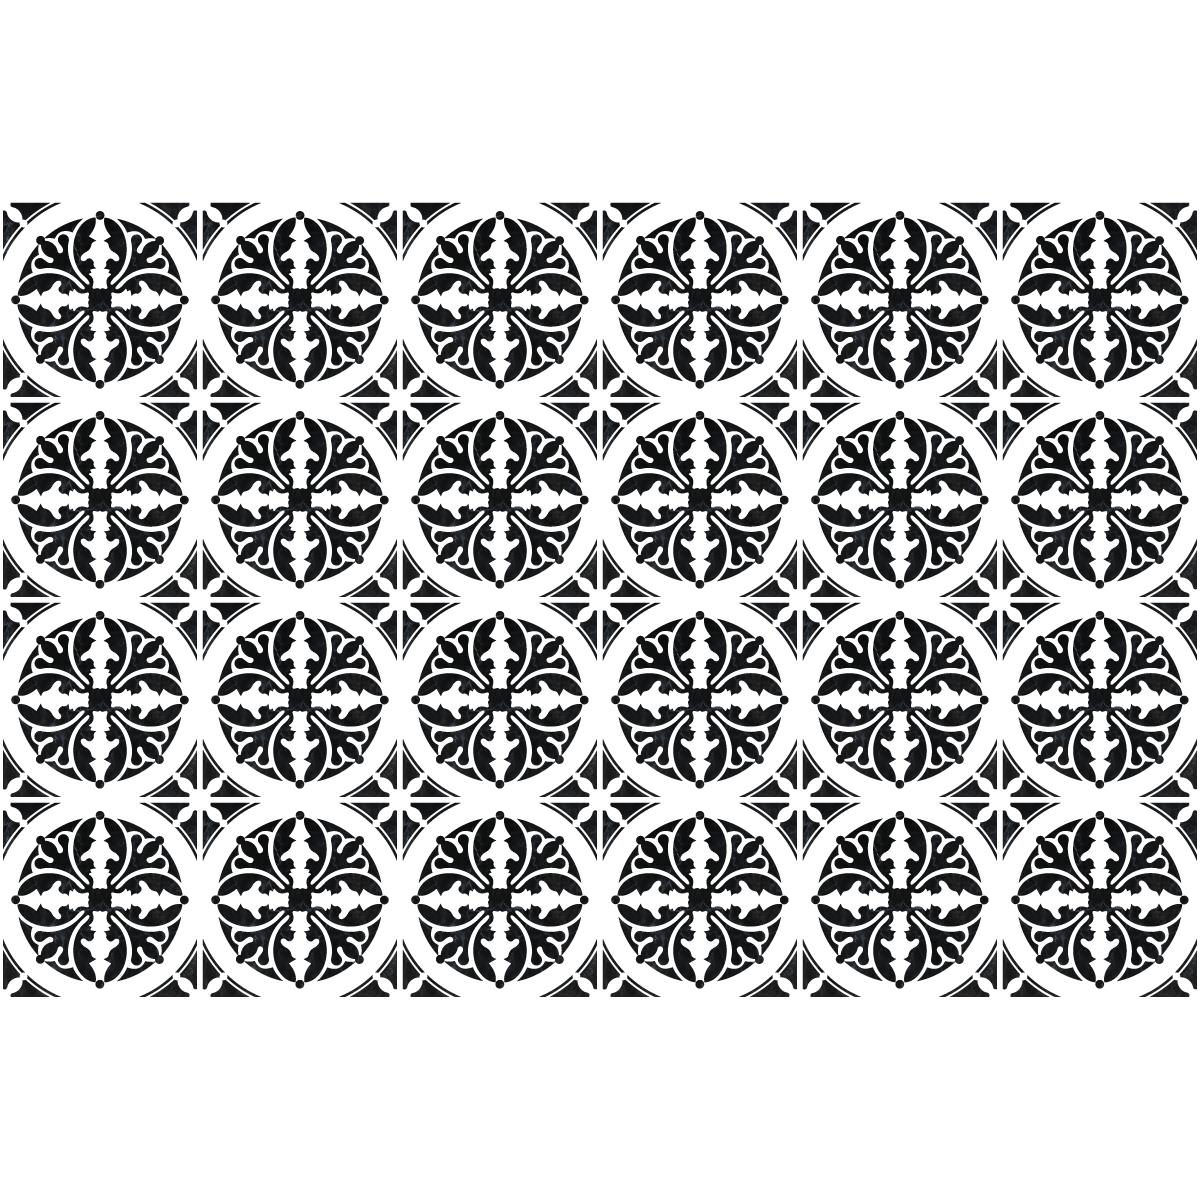 24 stickers carrelages azulejos mauricio salle de bain mur salle de bain ambiance sticker. Black Bedroom Furniture Sets. Home Design Ideas